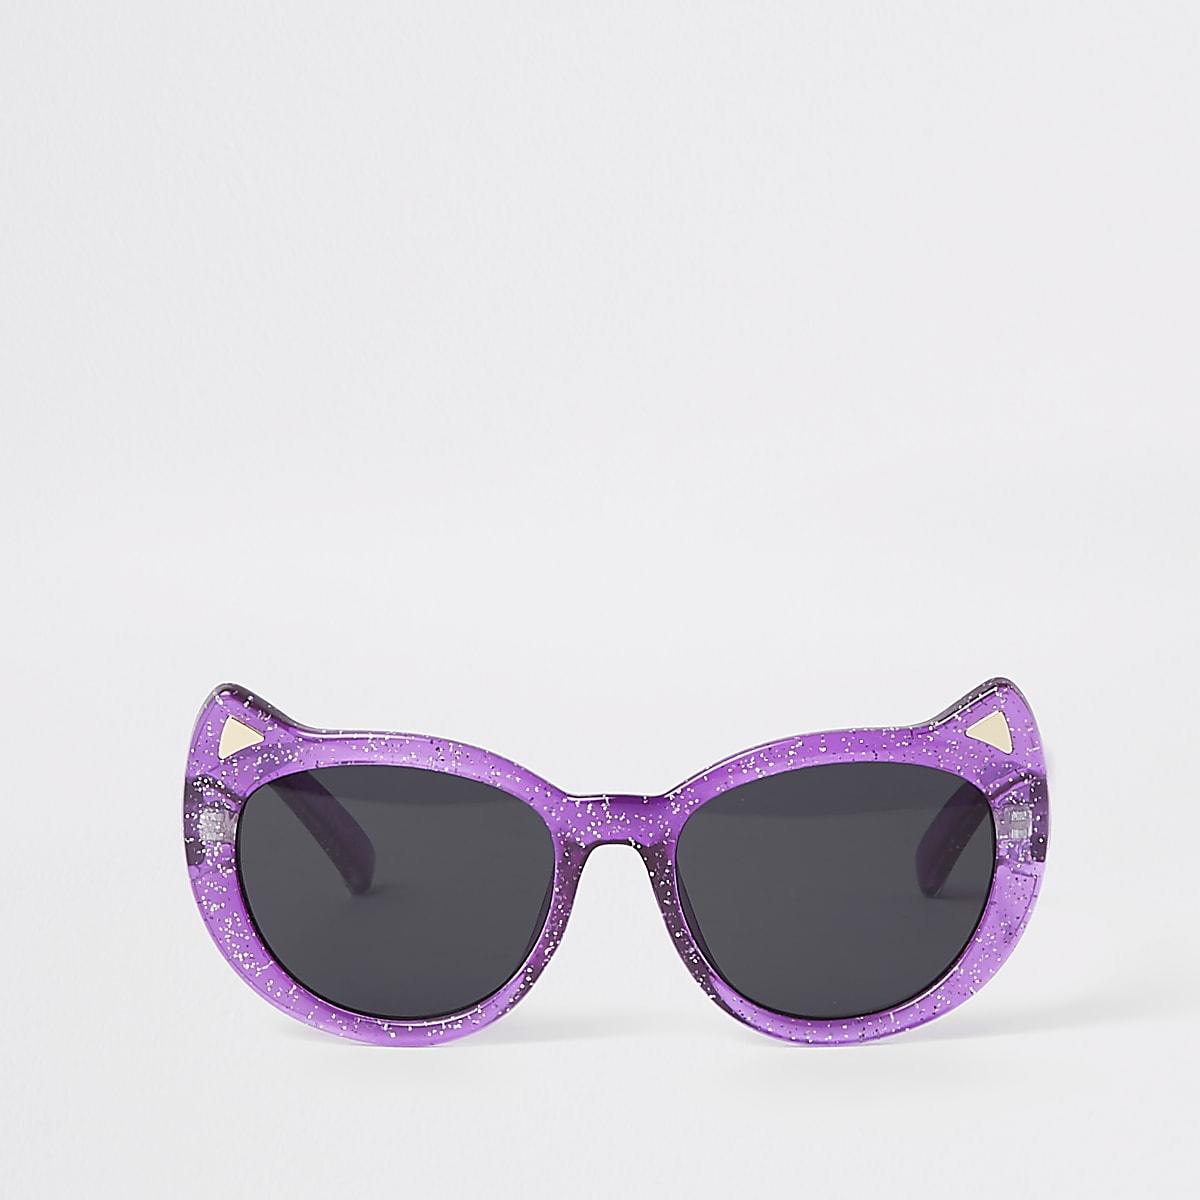 8d6679a3acda Mini girls purple glitter cat eye sunglasses - Baby Girls Accessories - Mini  Girls - girls